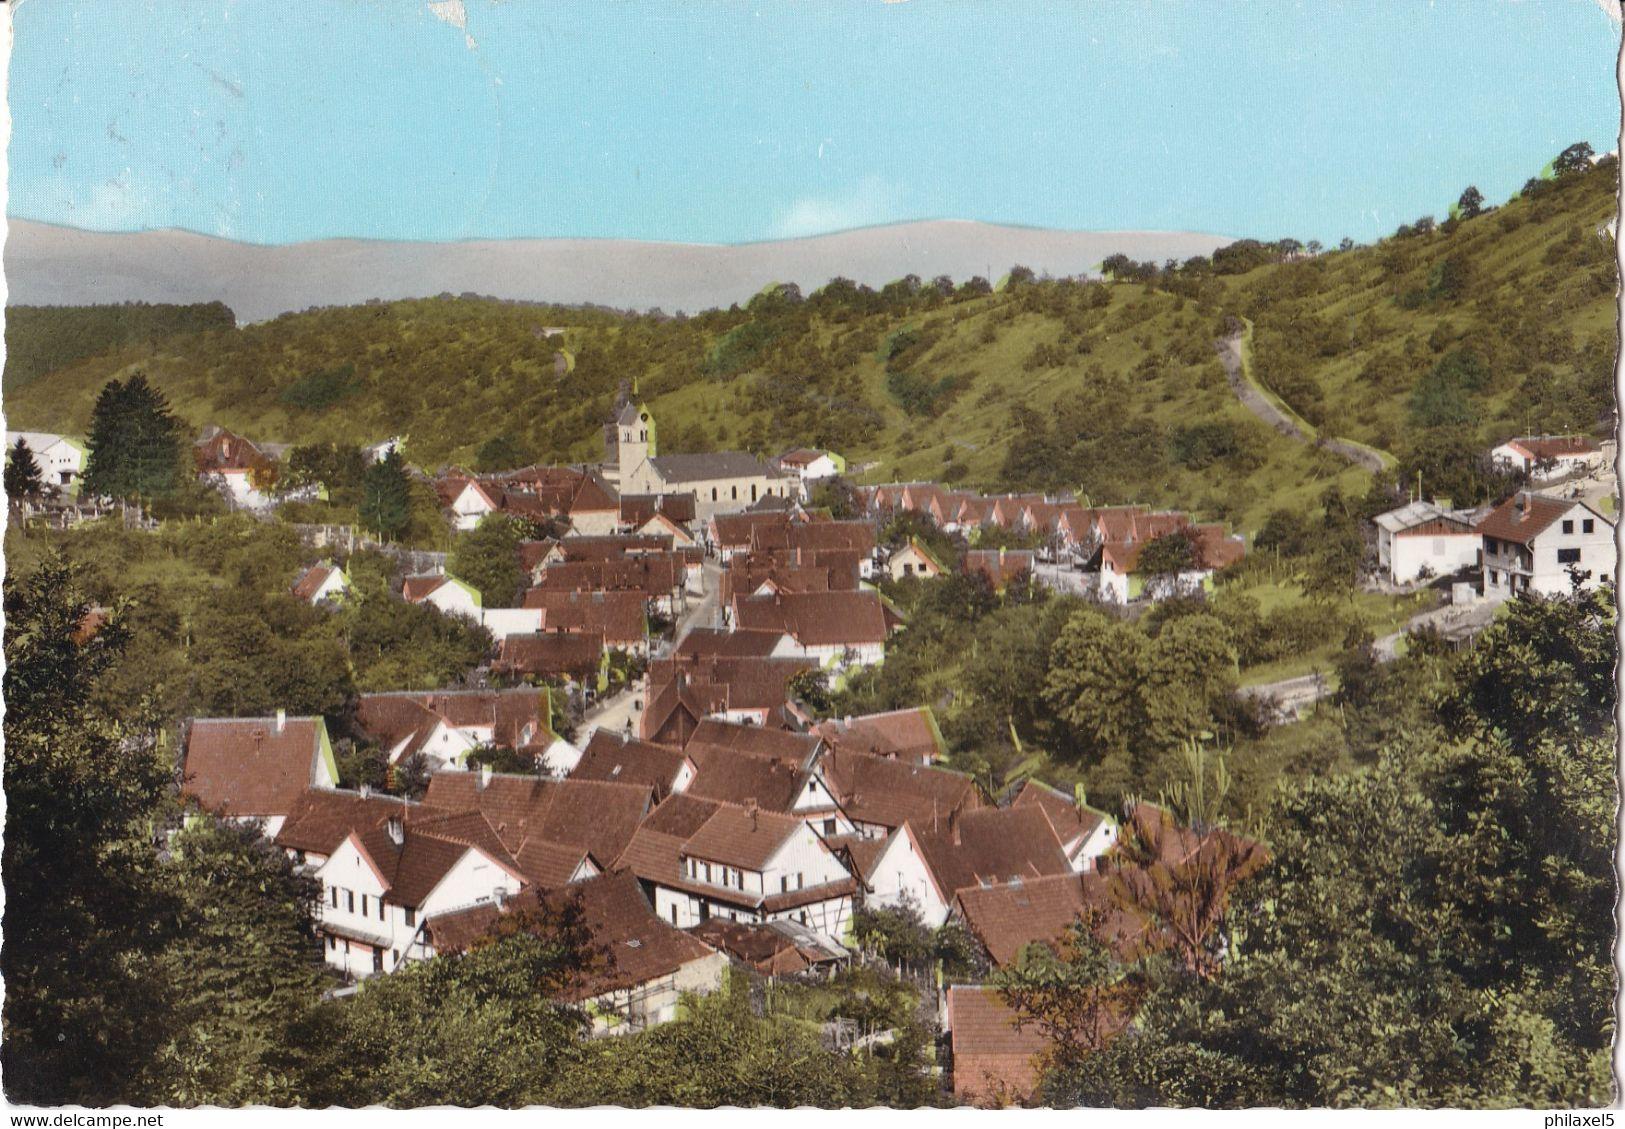 Duitsland - Baden-Württemberg - Sulzbach - Suzlbach Im Schwarzwald - Murgtal - Kleur/color - Gebruikt - Sonstige